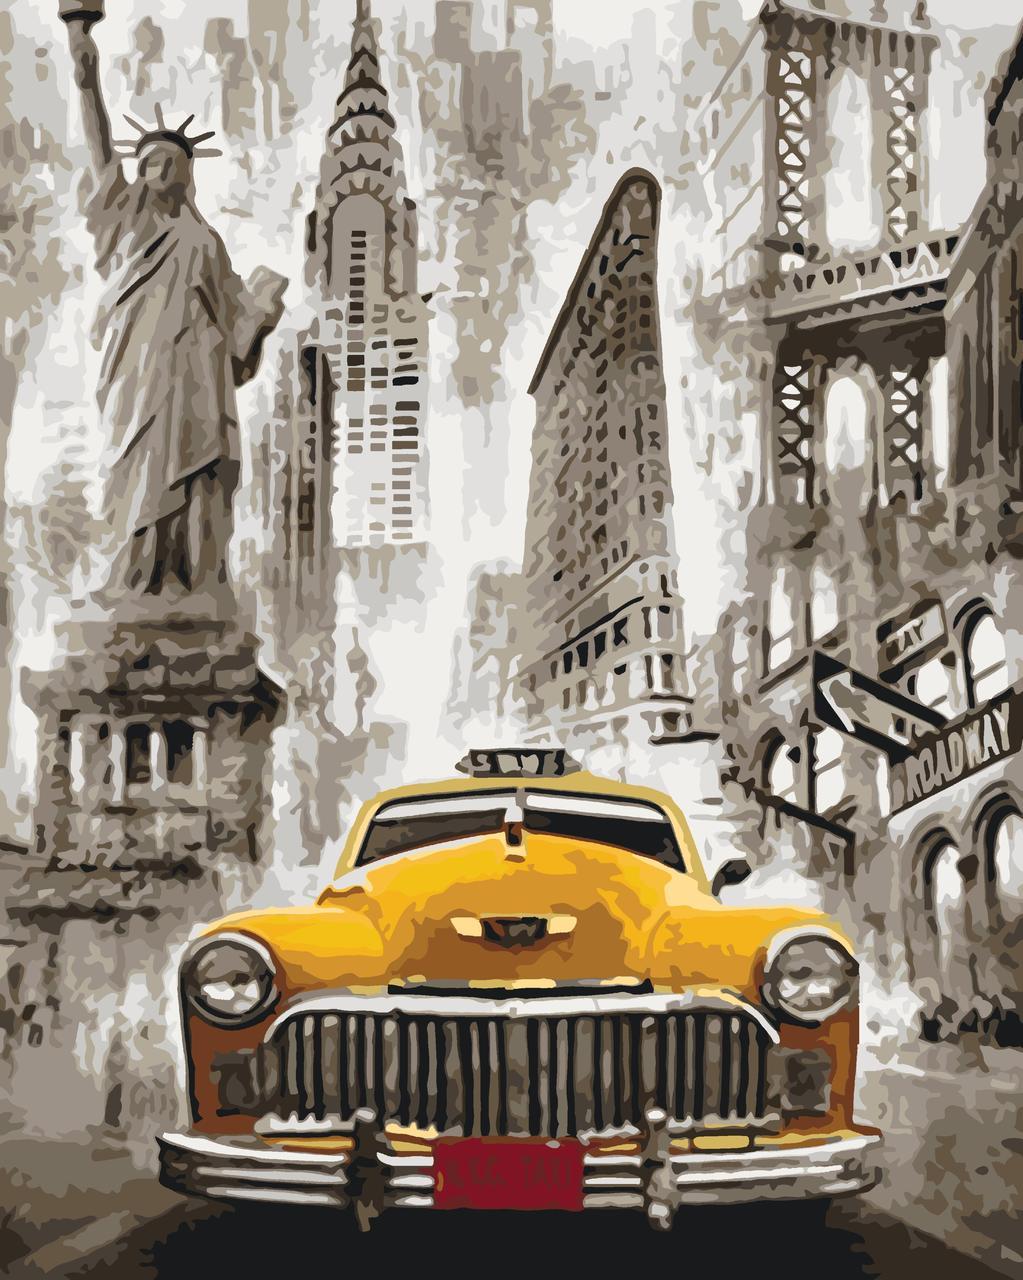 КНО3506 Раскраска по номерам Такси Нью-Йорка, Без коробки